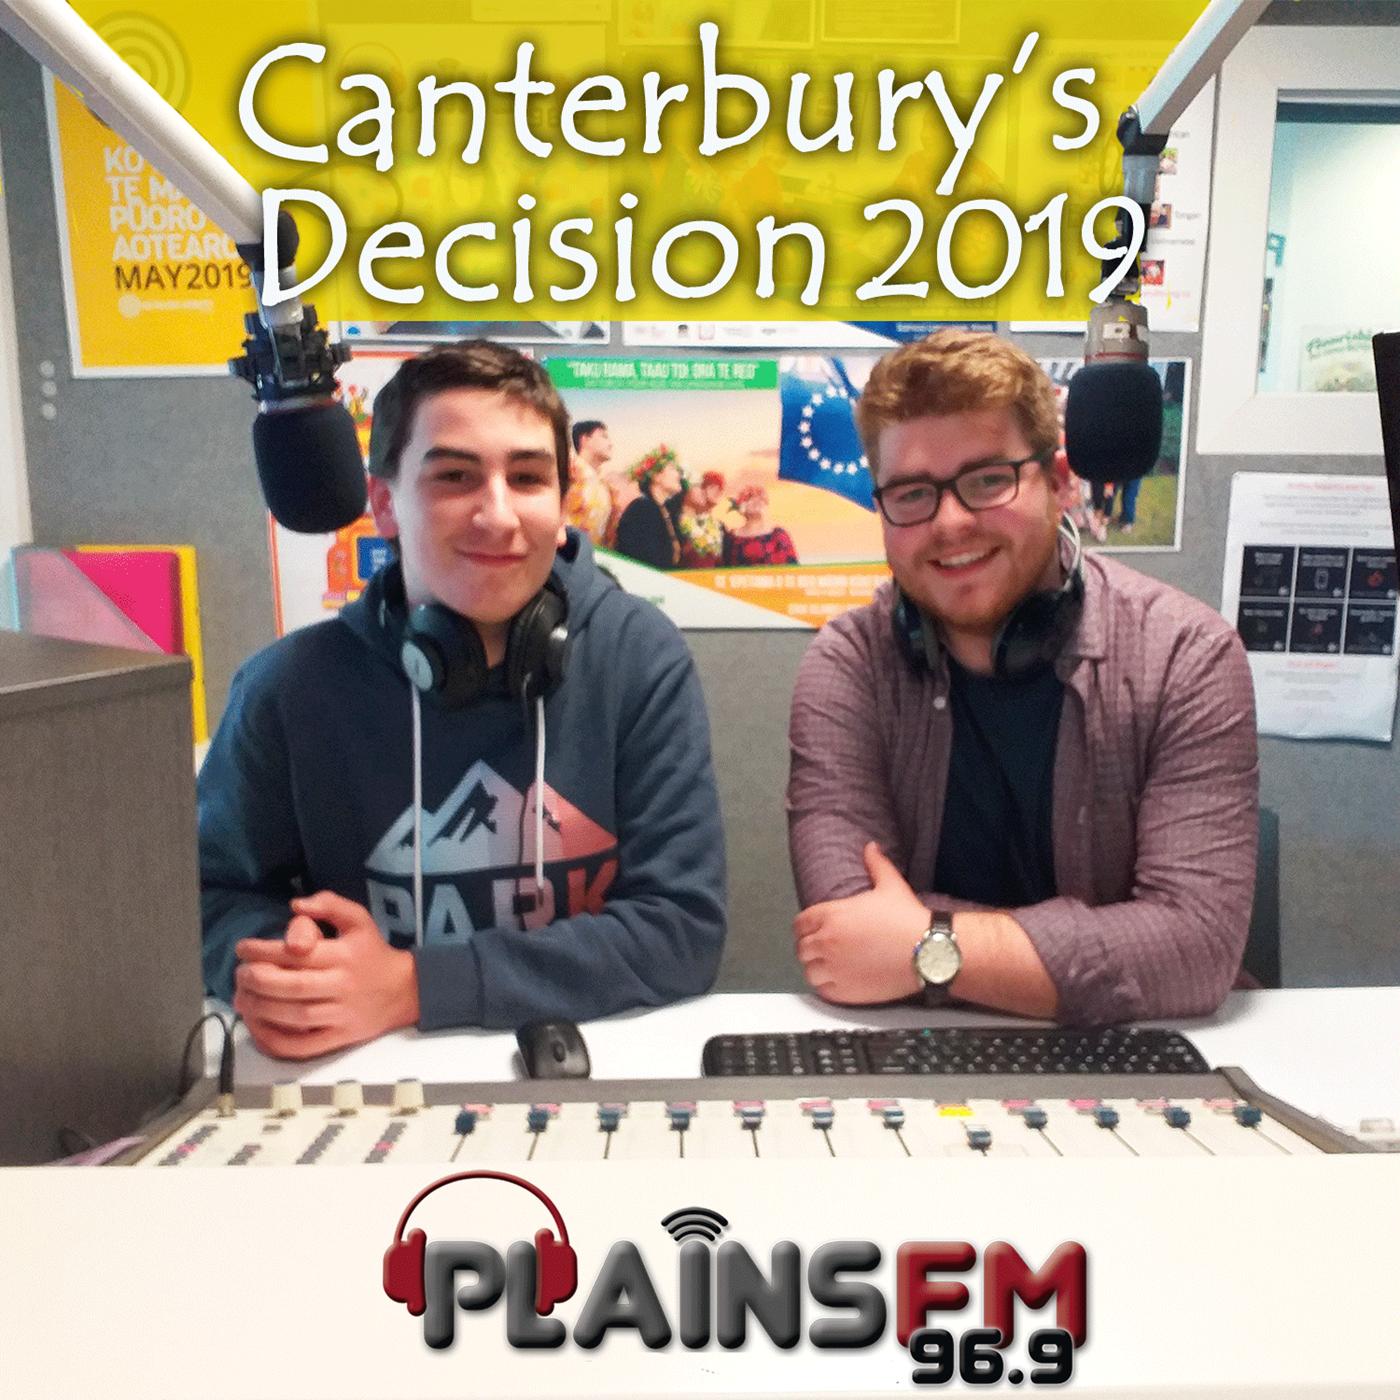 Canterbury's Decision 2019